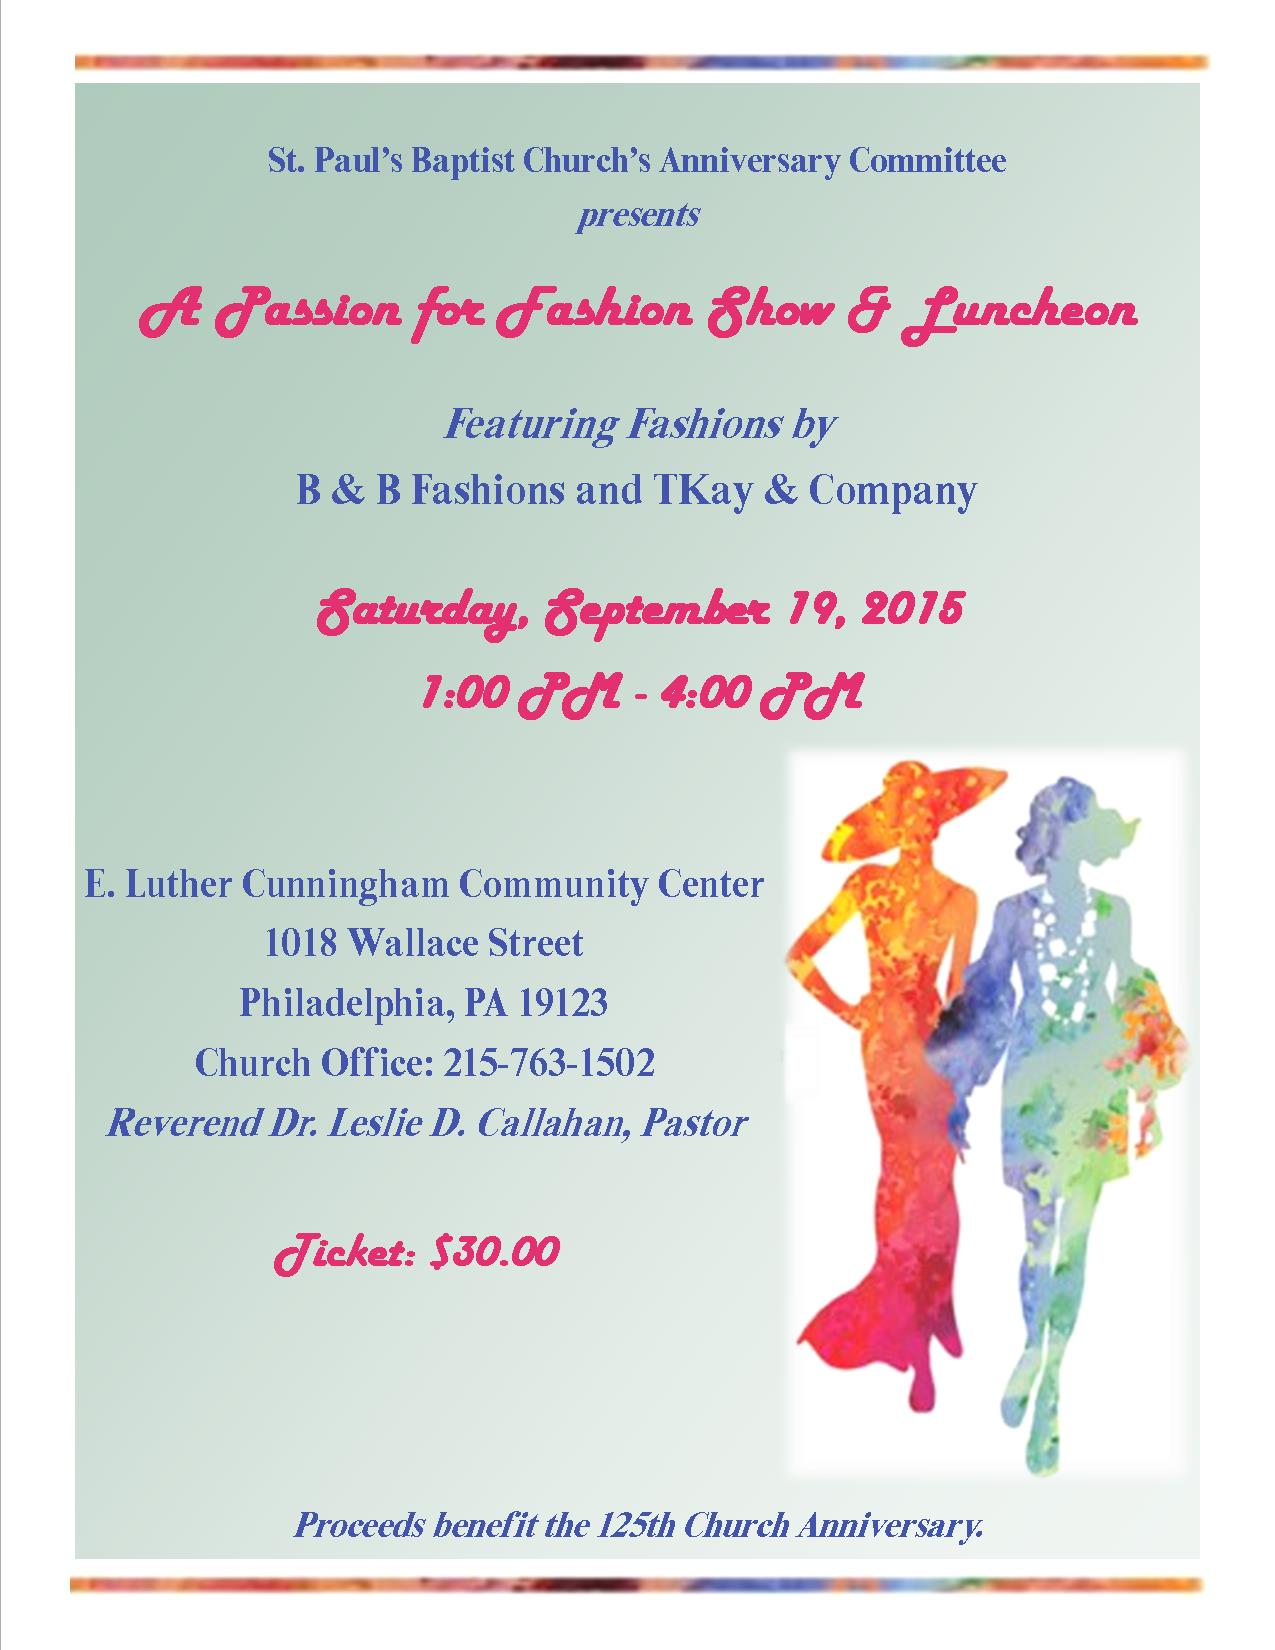 Fashion Show Invitation was amazing invitation example